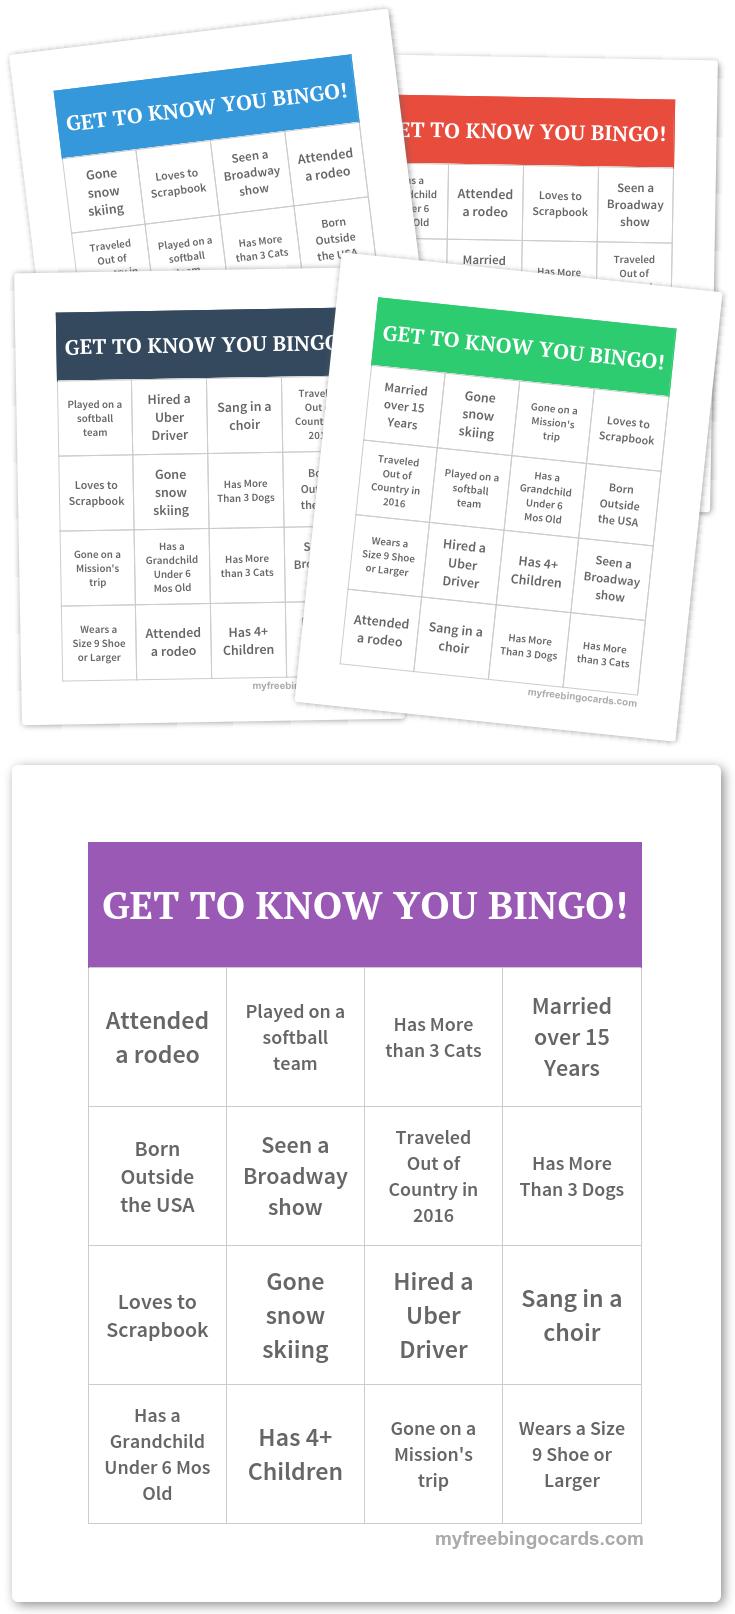 Free Printable Bingo Cards | Bingo Cards Printable, Bingo